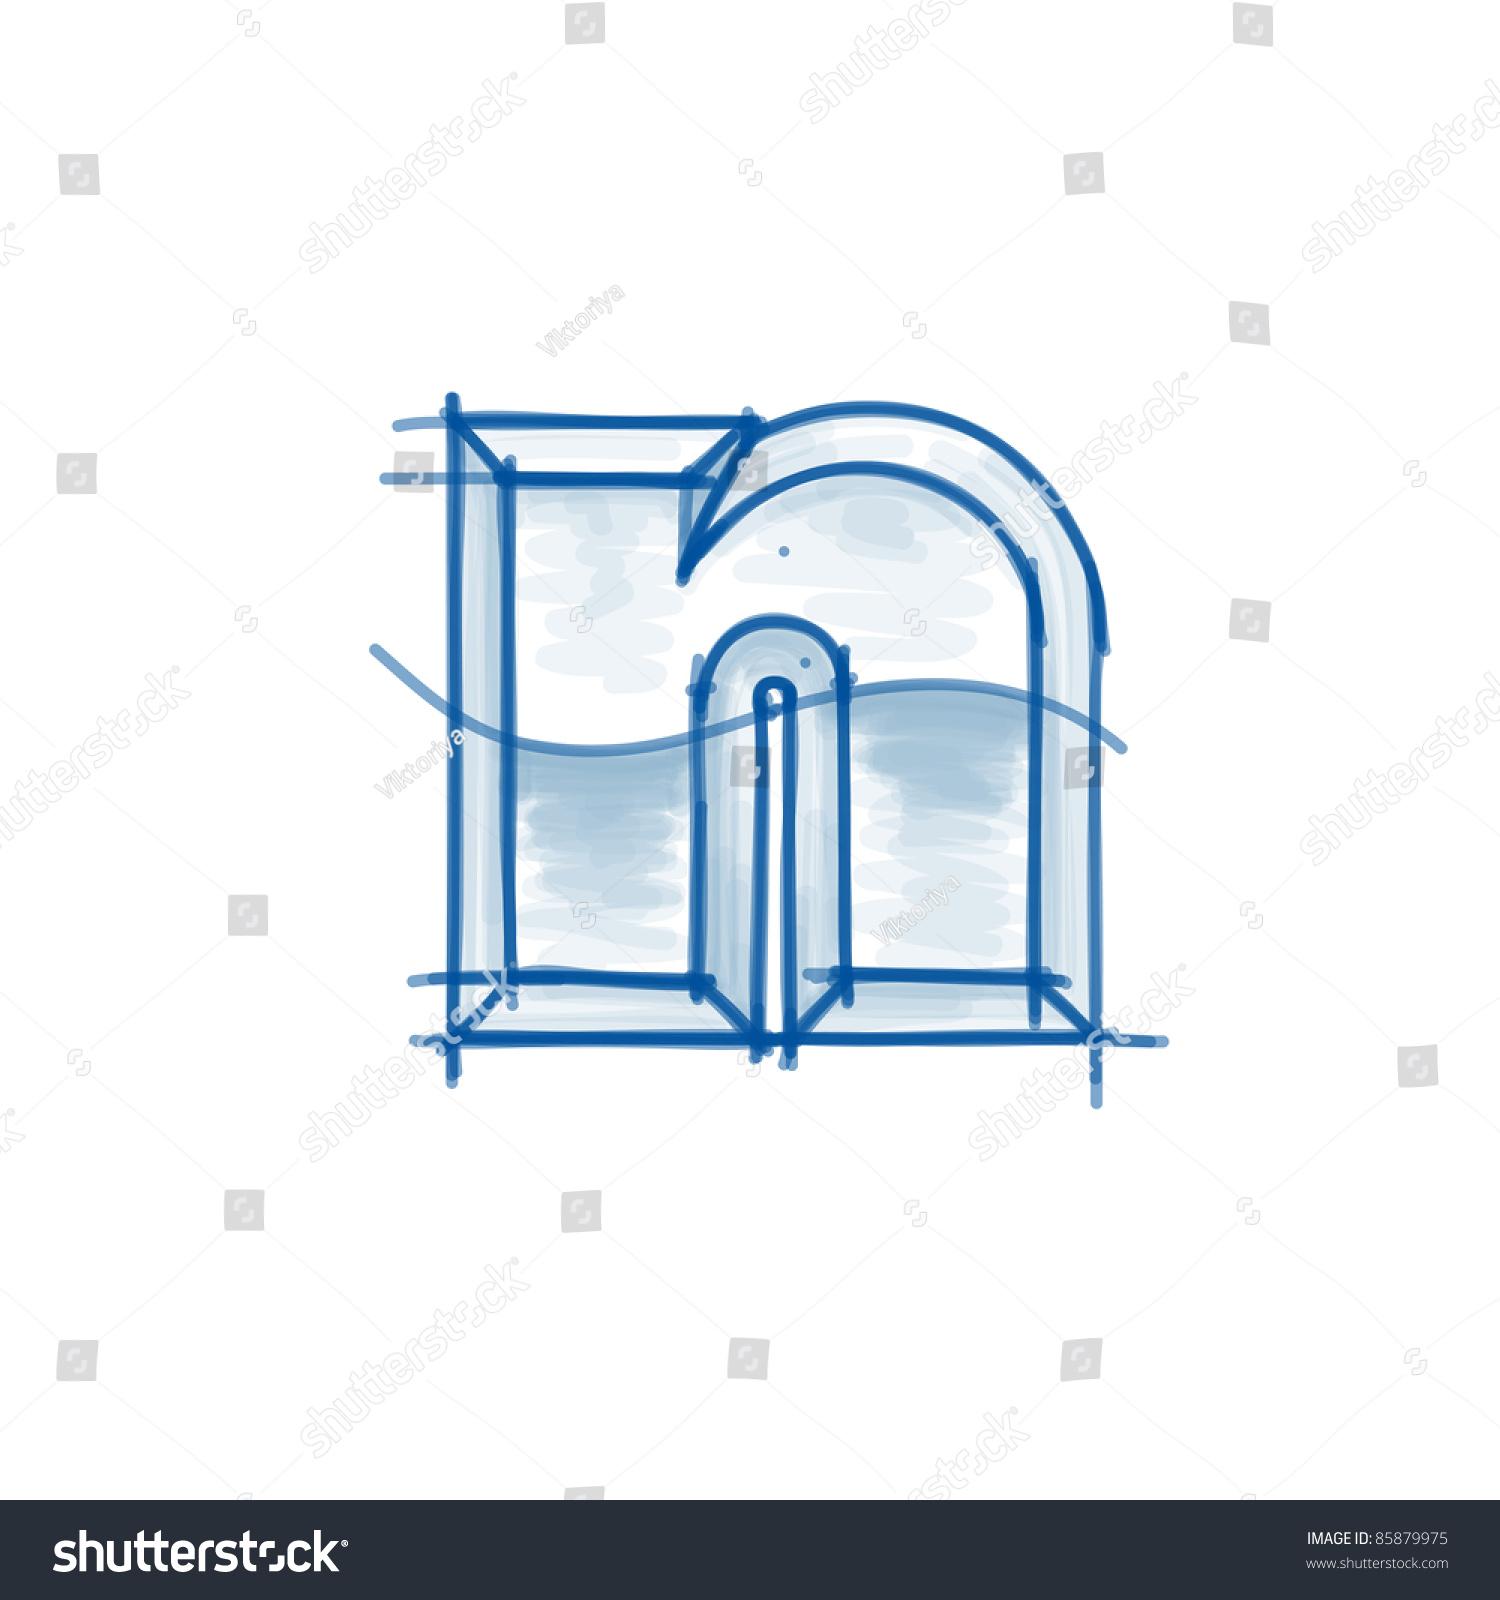 Blueprint font sketch letter n marker stock vector 85879975 blueprint font sketch letter n marker drawing malvernweather Gallery